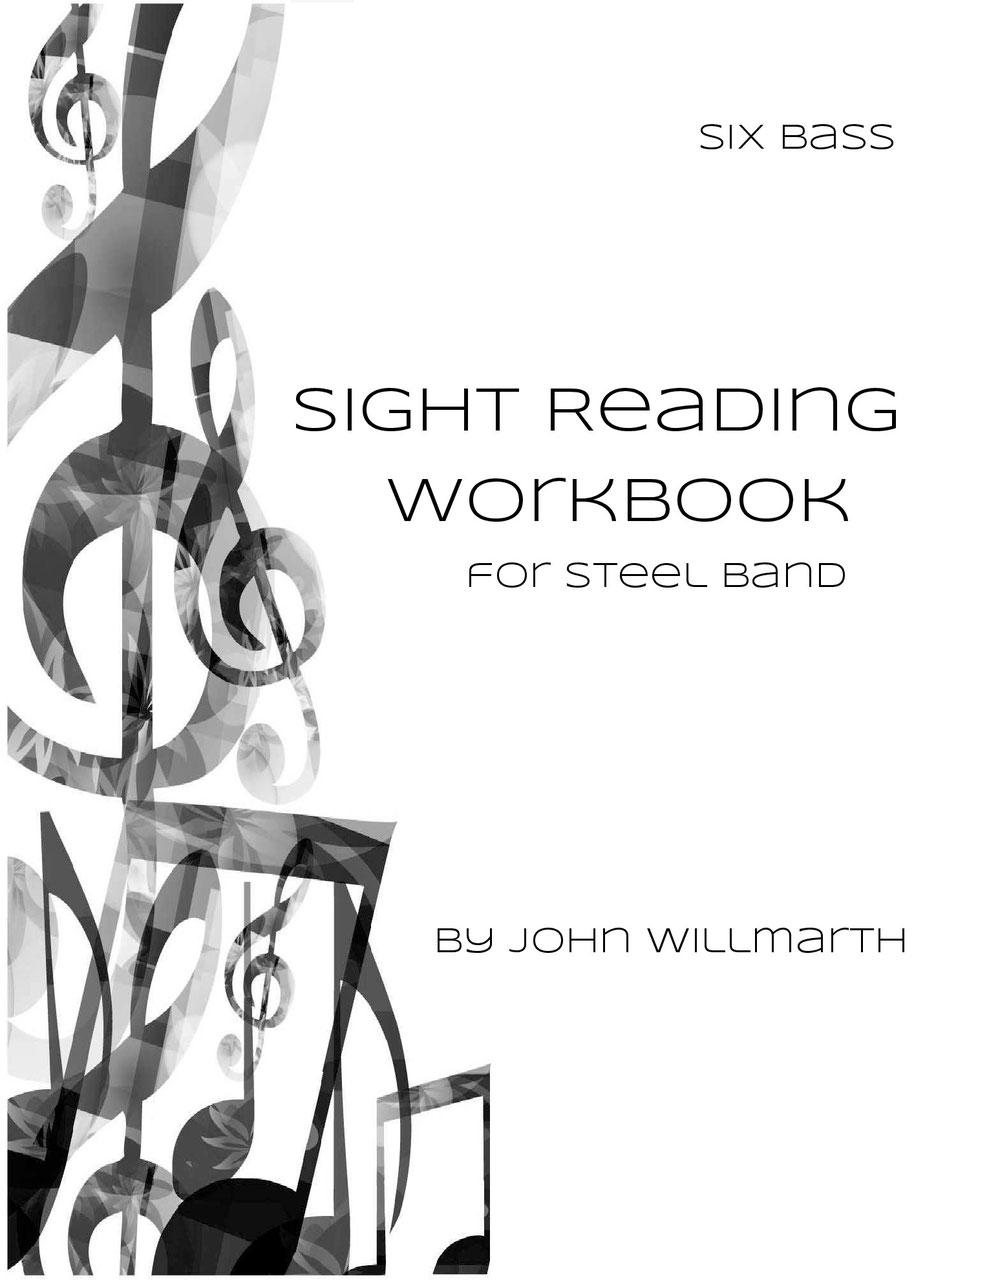 Sight Reading Workbook for Steel Band - John Willmarth Music